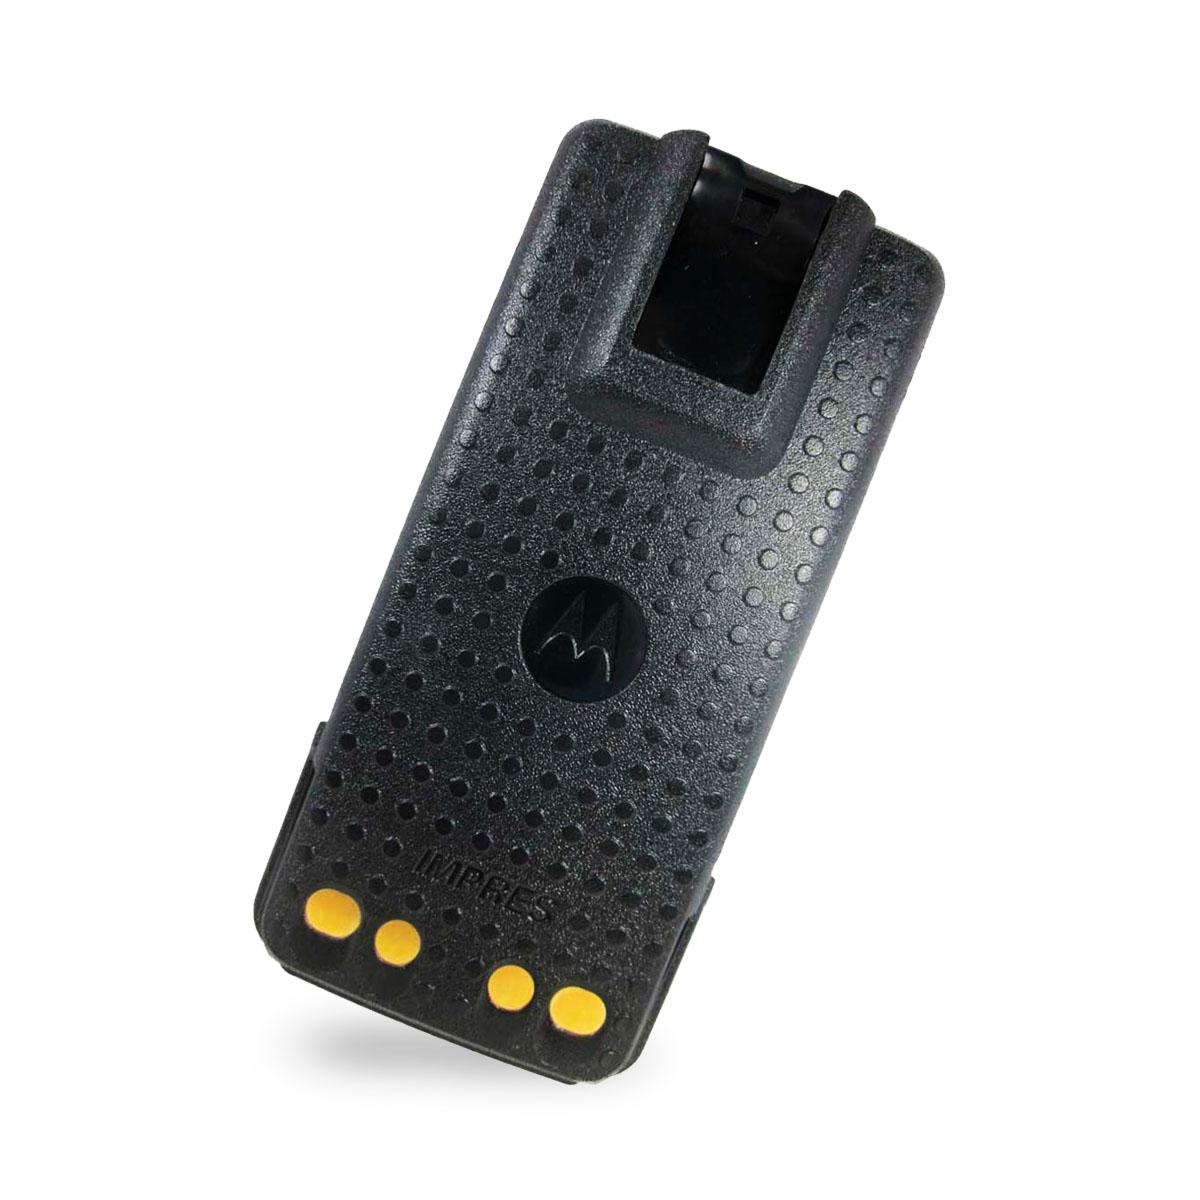 Batería Motorola Li-Ion 2500 mAh para radios serie DGP NNTN8560A